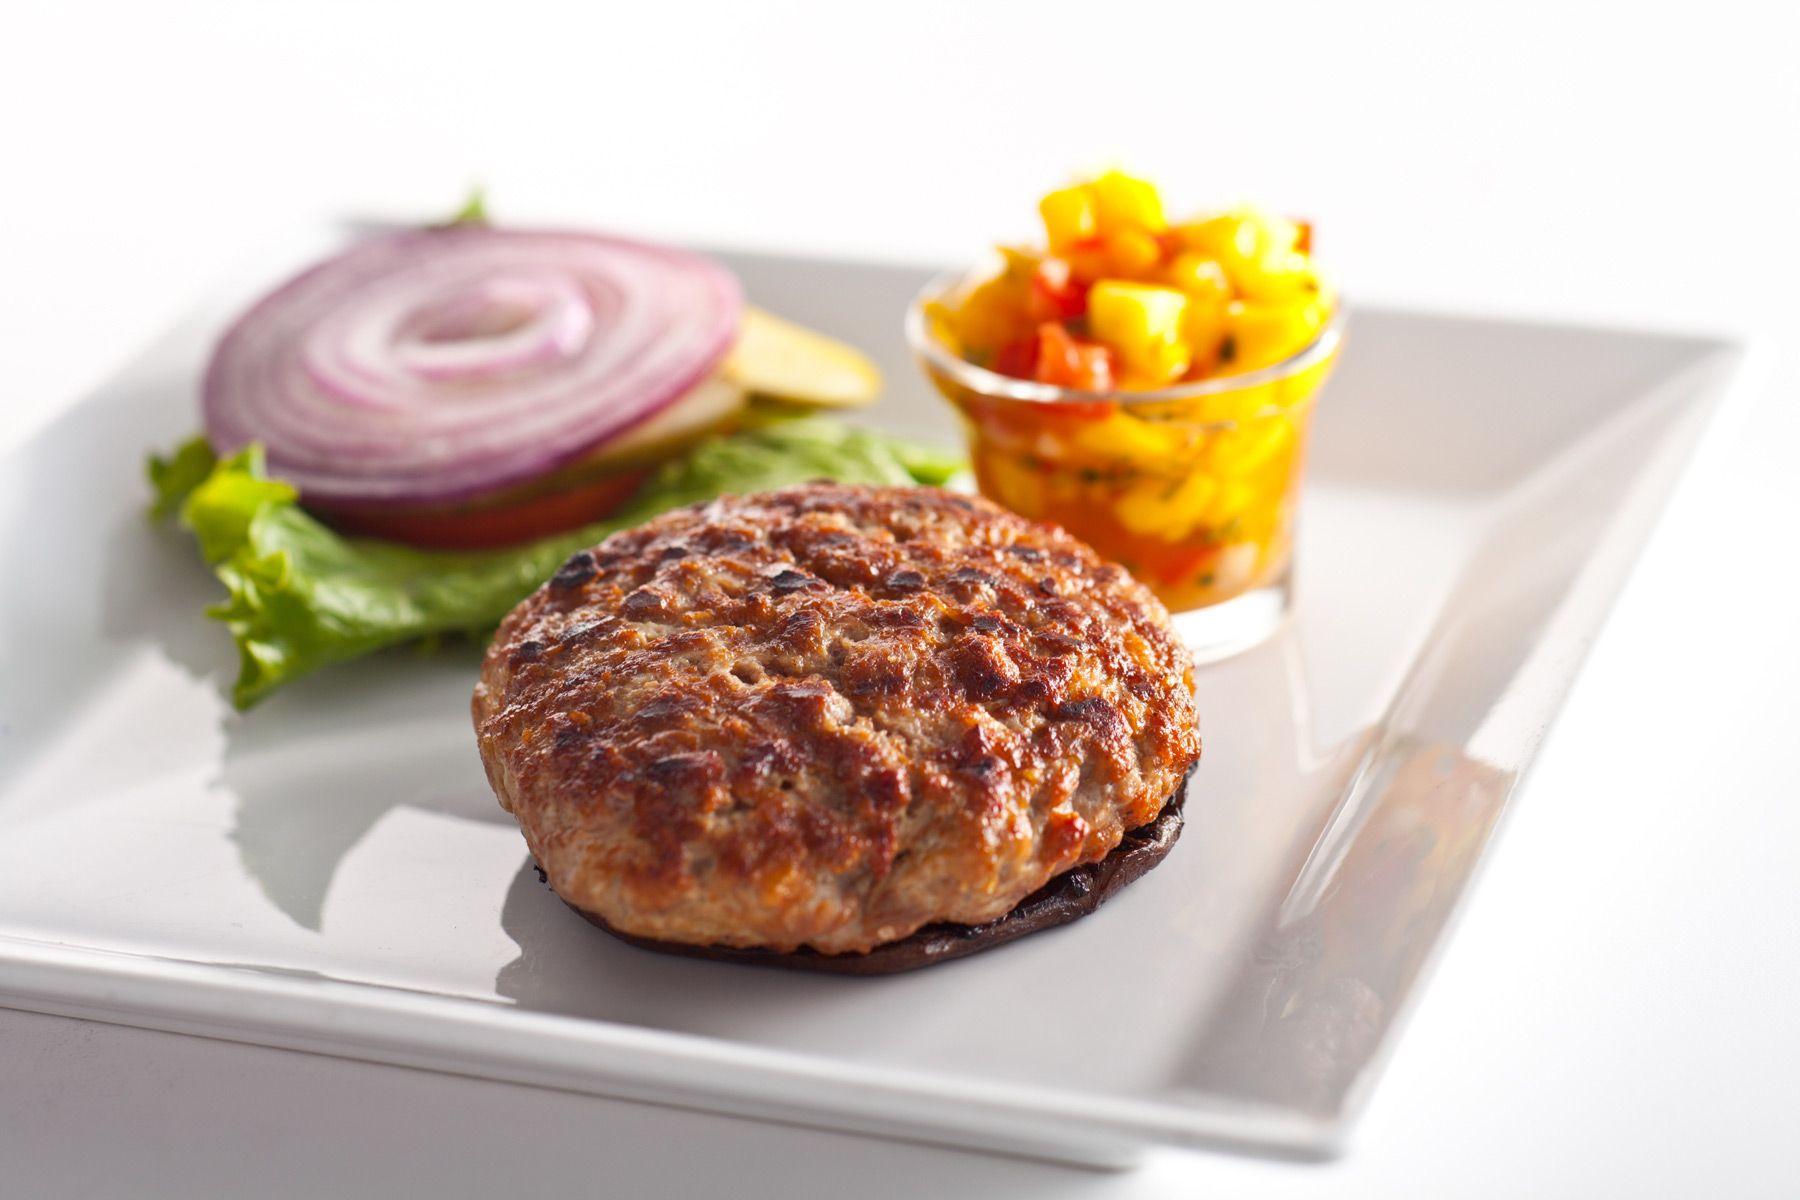 Veggie-Burger-Michael-Garbin-Union-League-of-Chicago.jpg